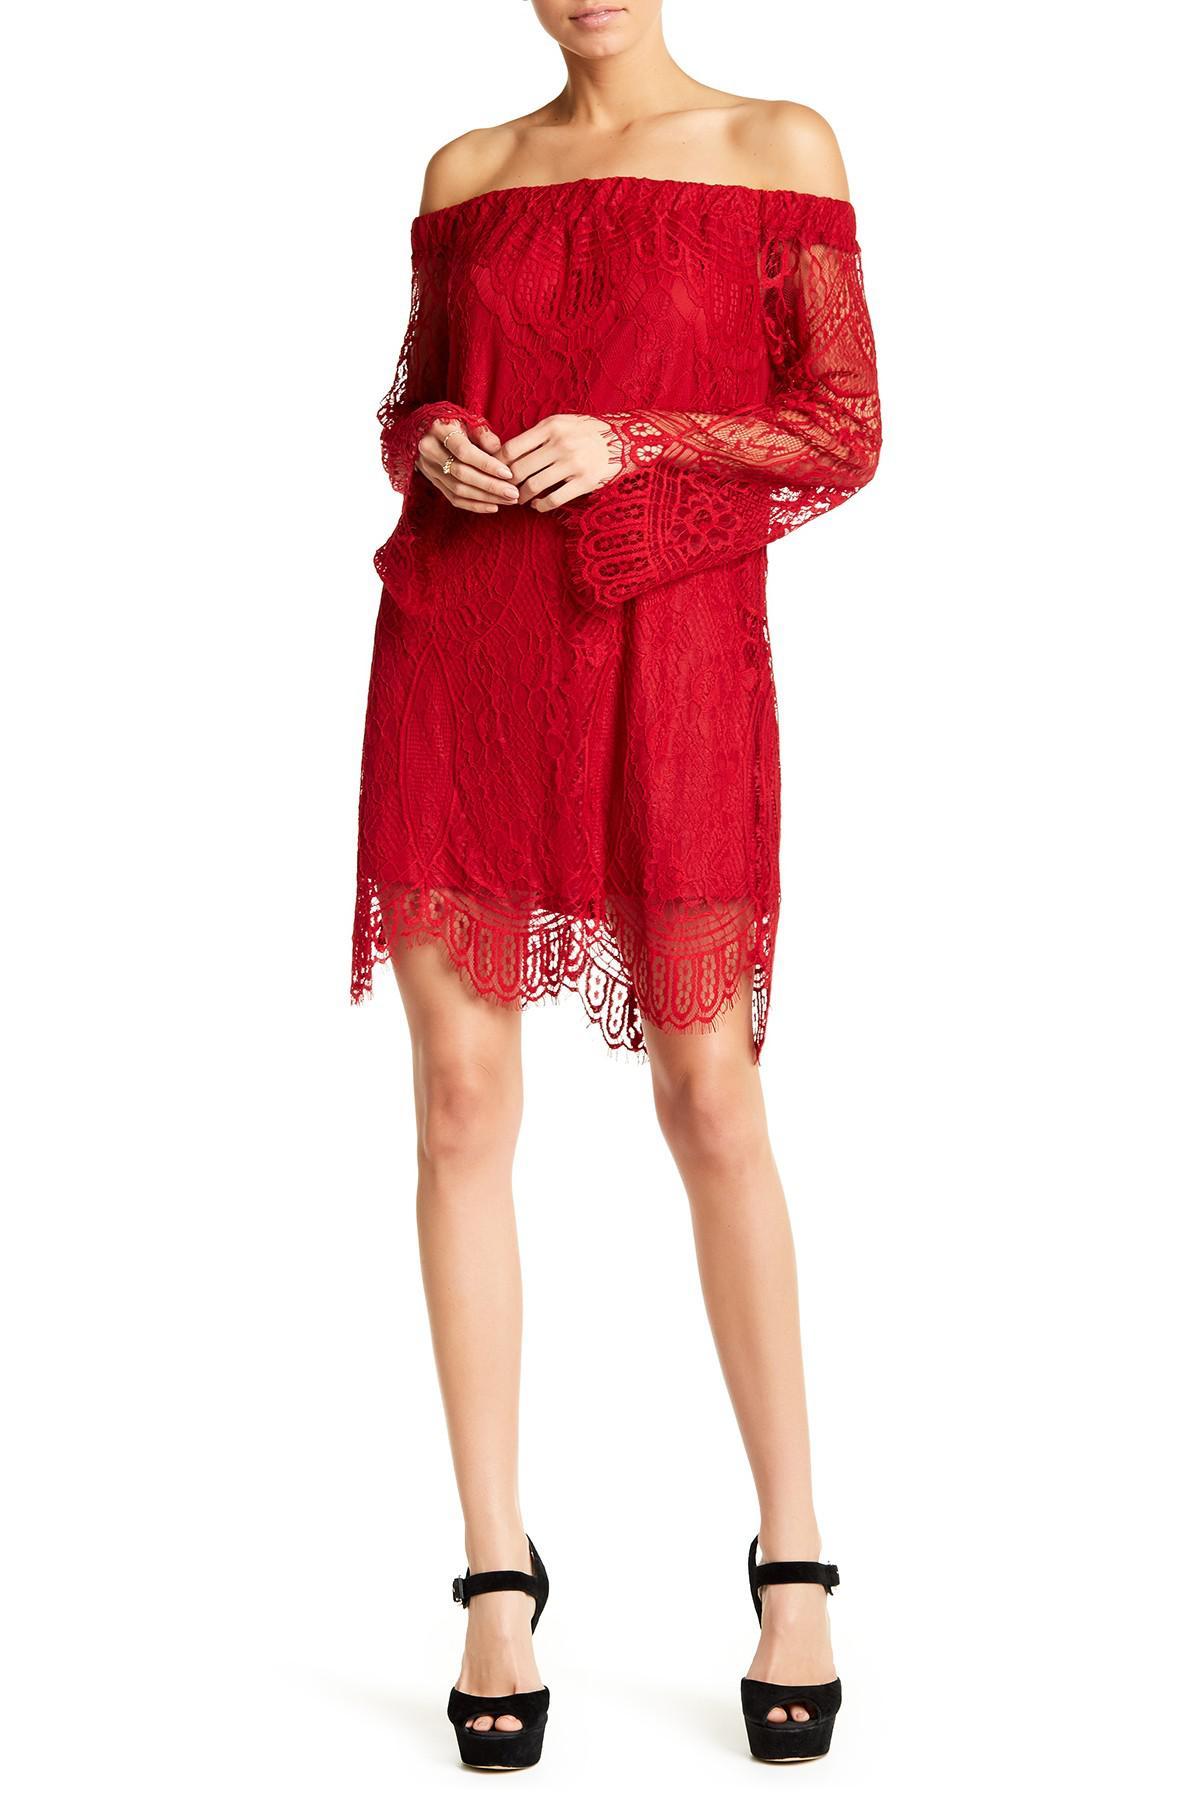 Love fire lace dress